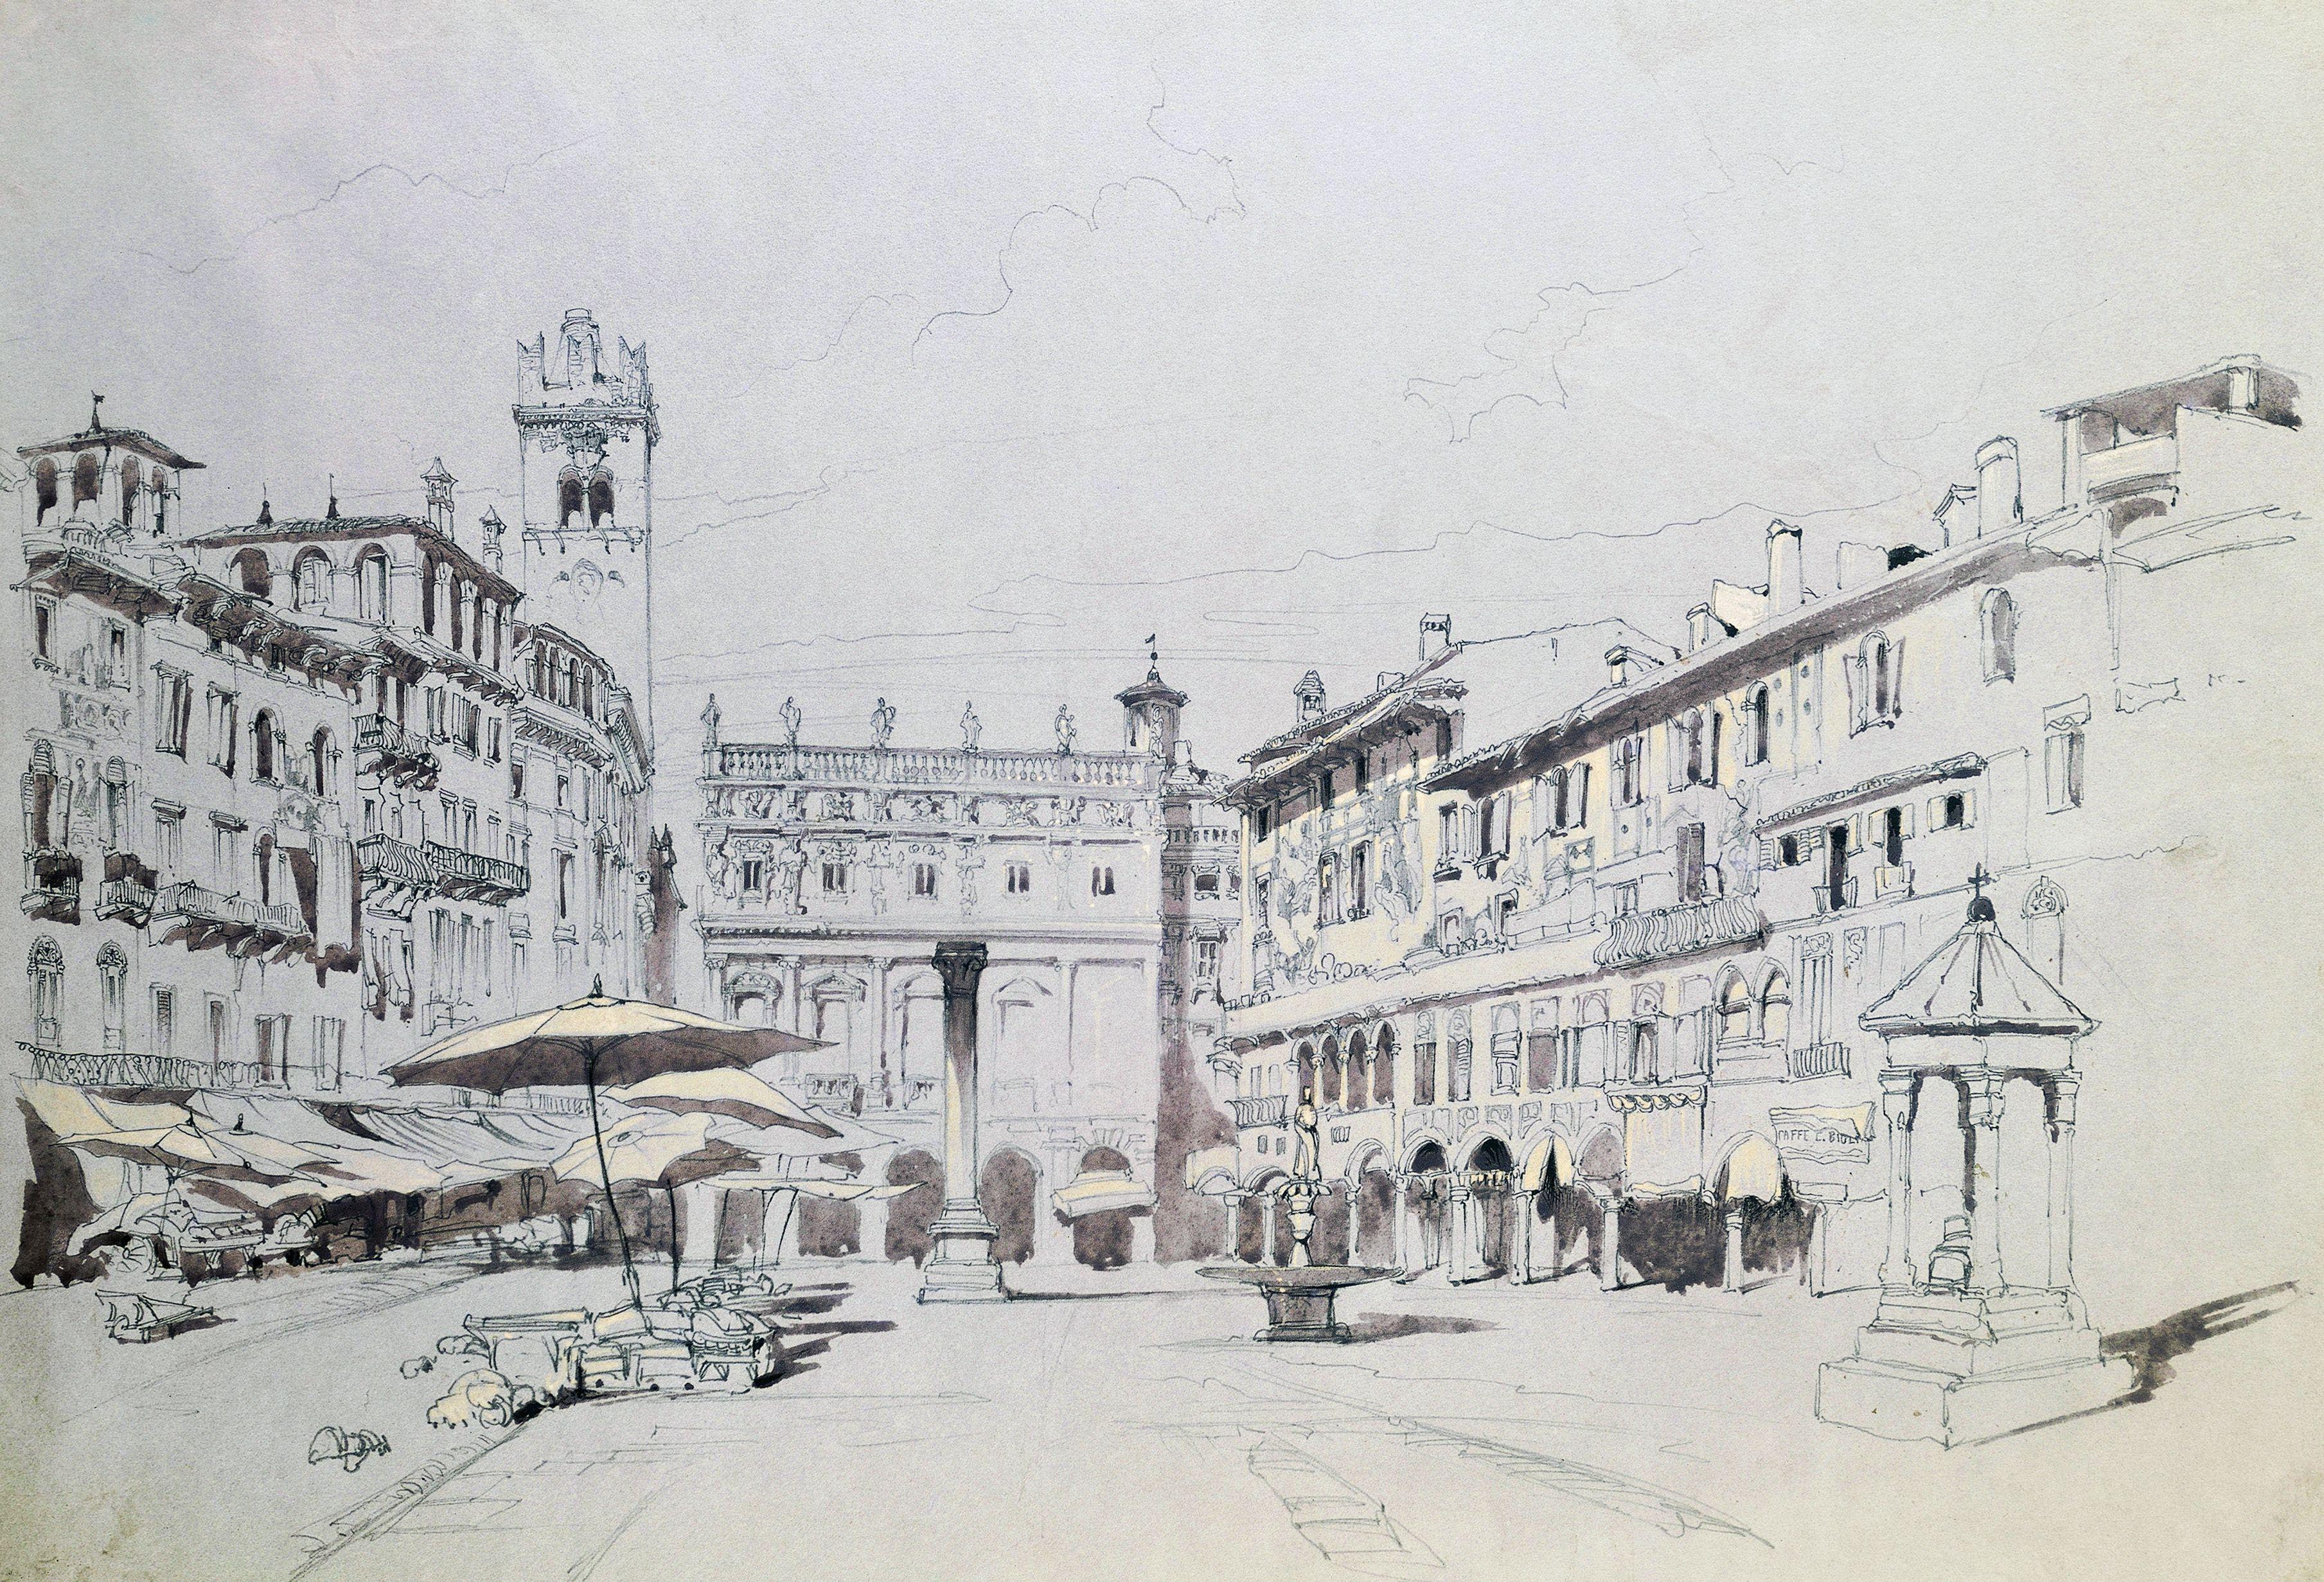 Watercolor (C.1841) of Piazza delle Erbe in Verona, Italy, by John Ruskin